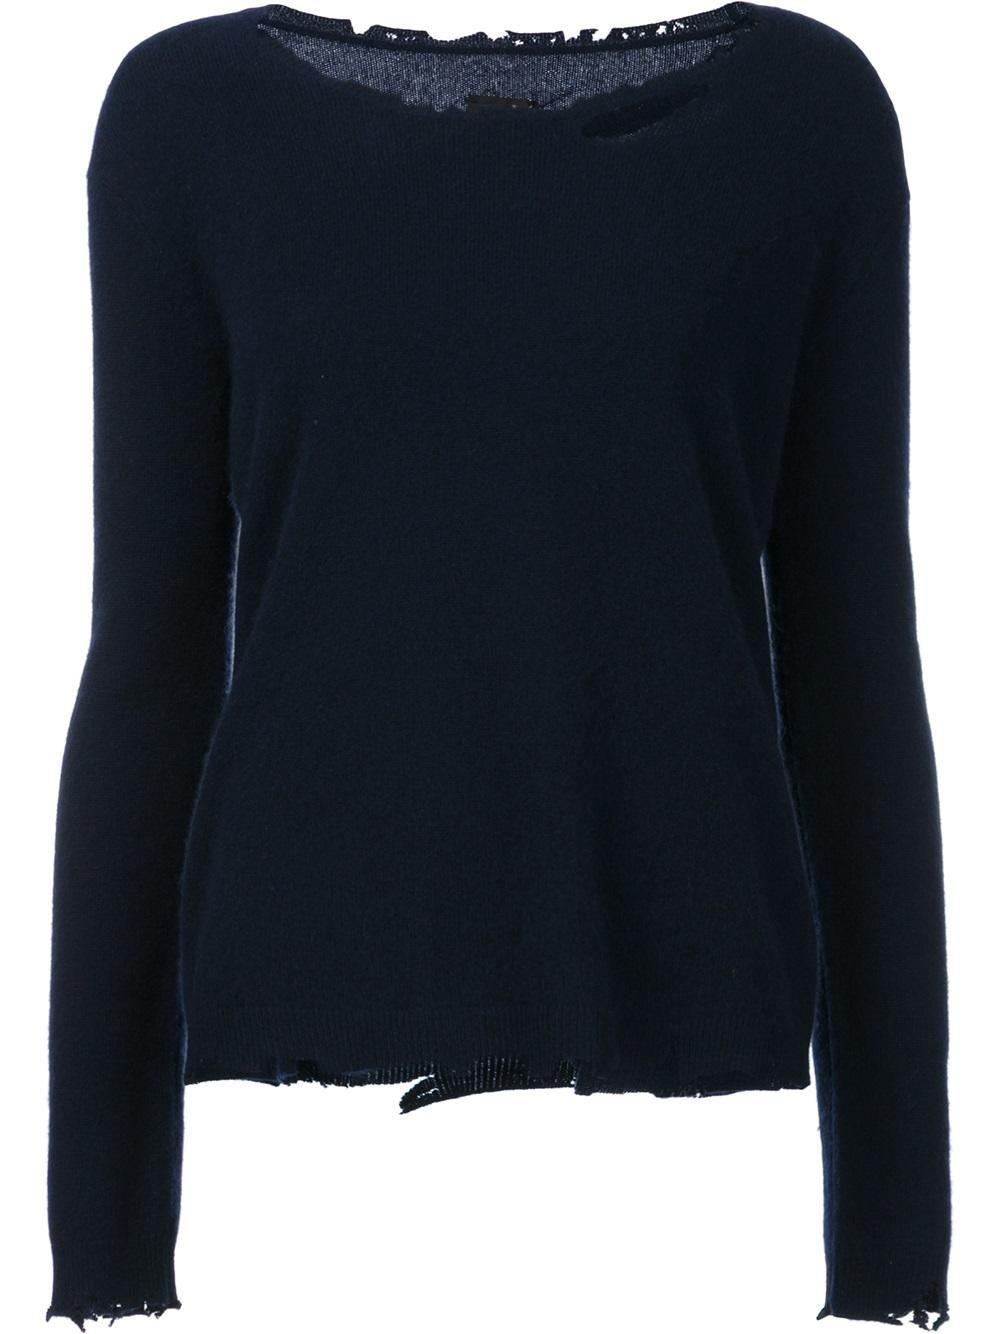 RtA Destroyed Effect Jumper, http://www.kirnazabete.com/just-in/sweater-ls-cashmere-crew-neck